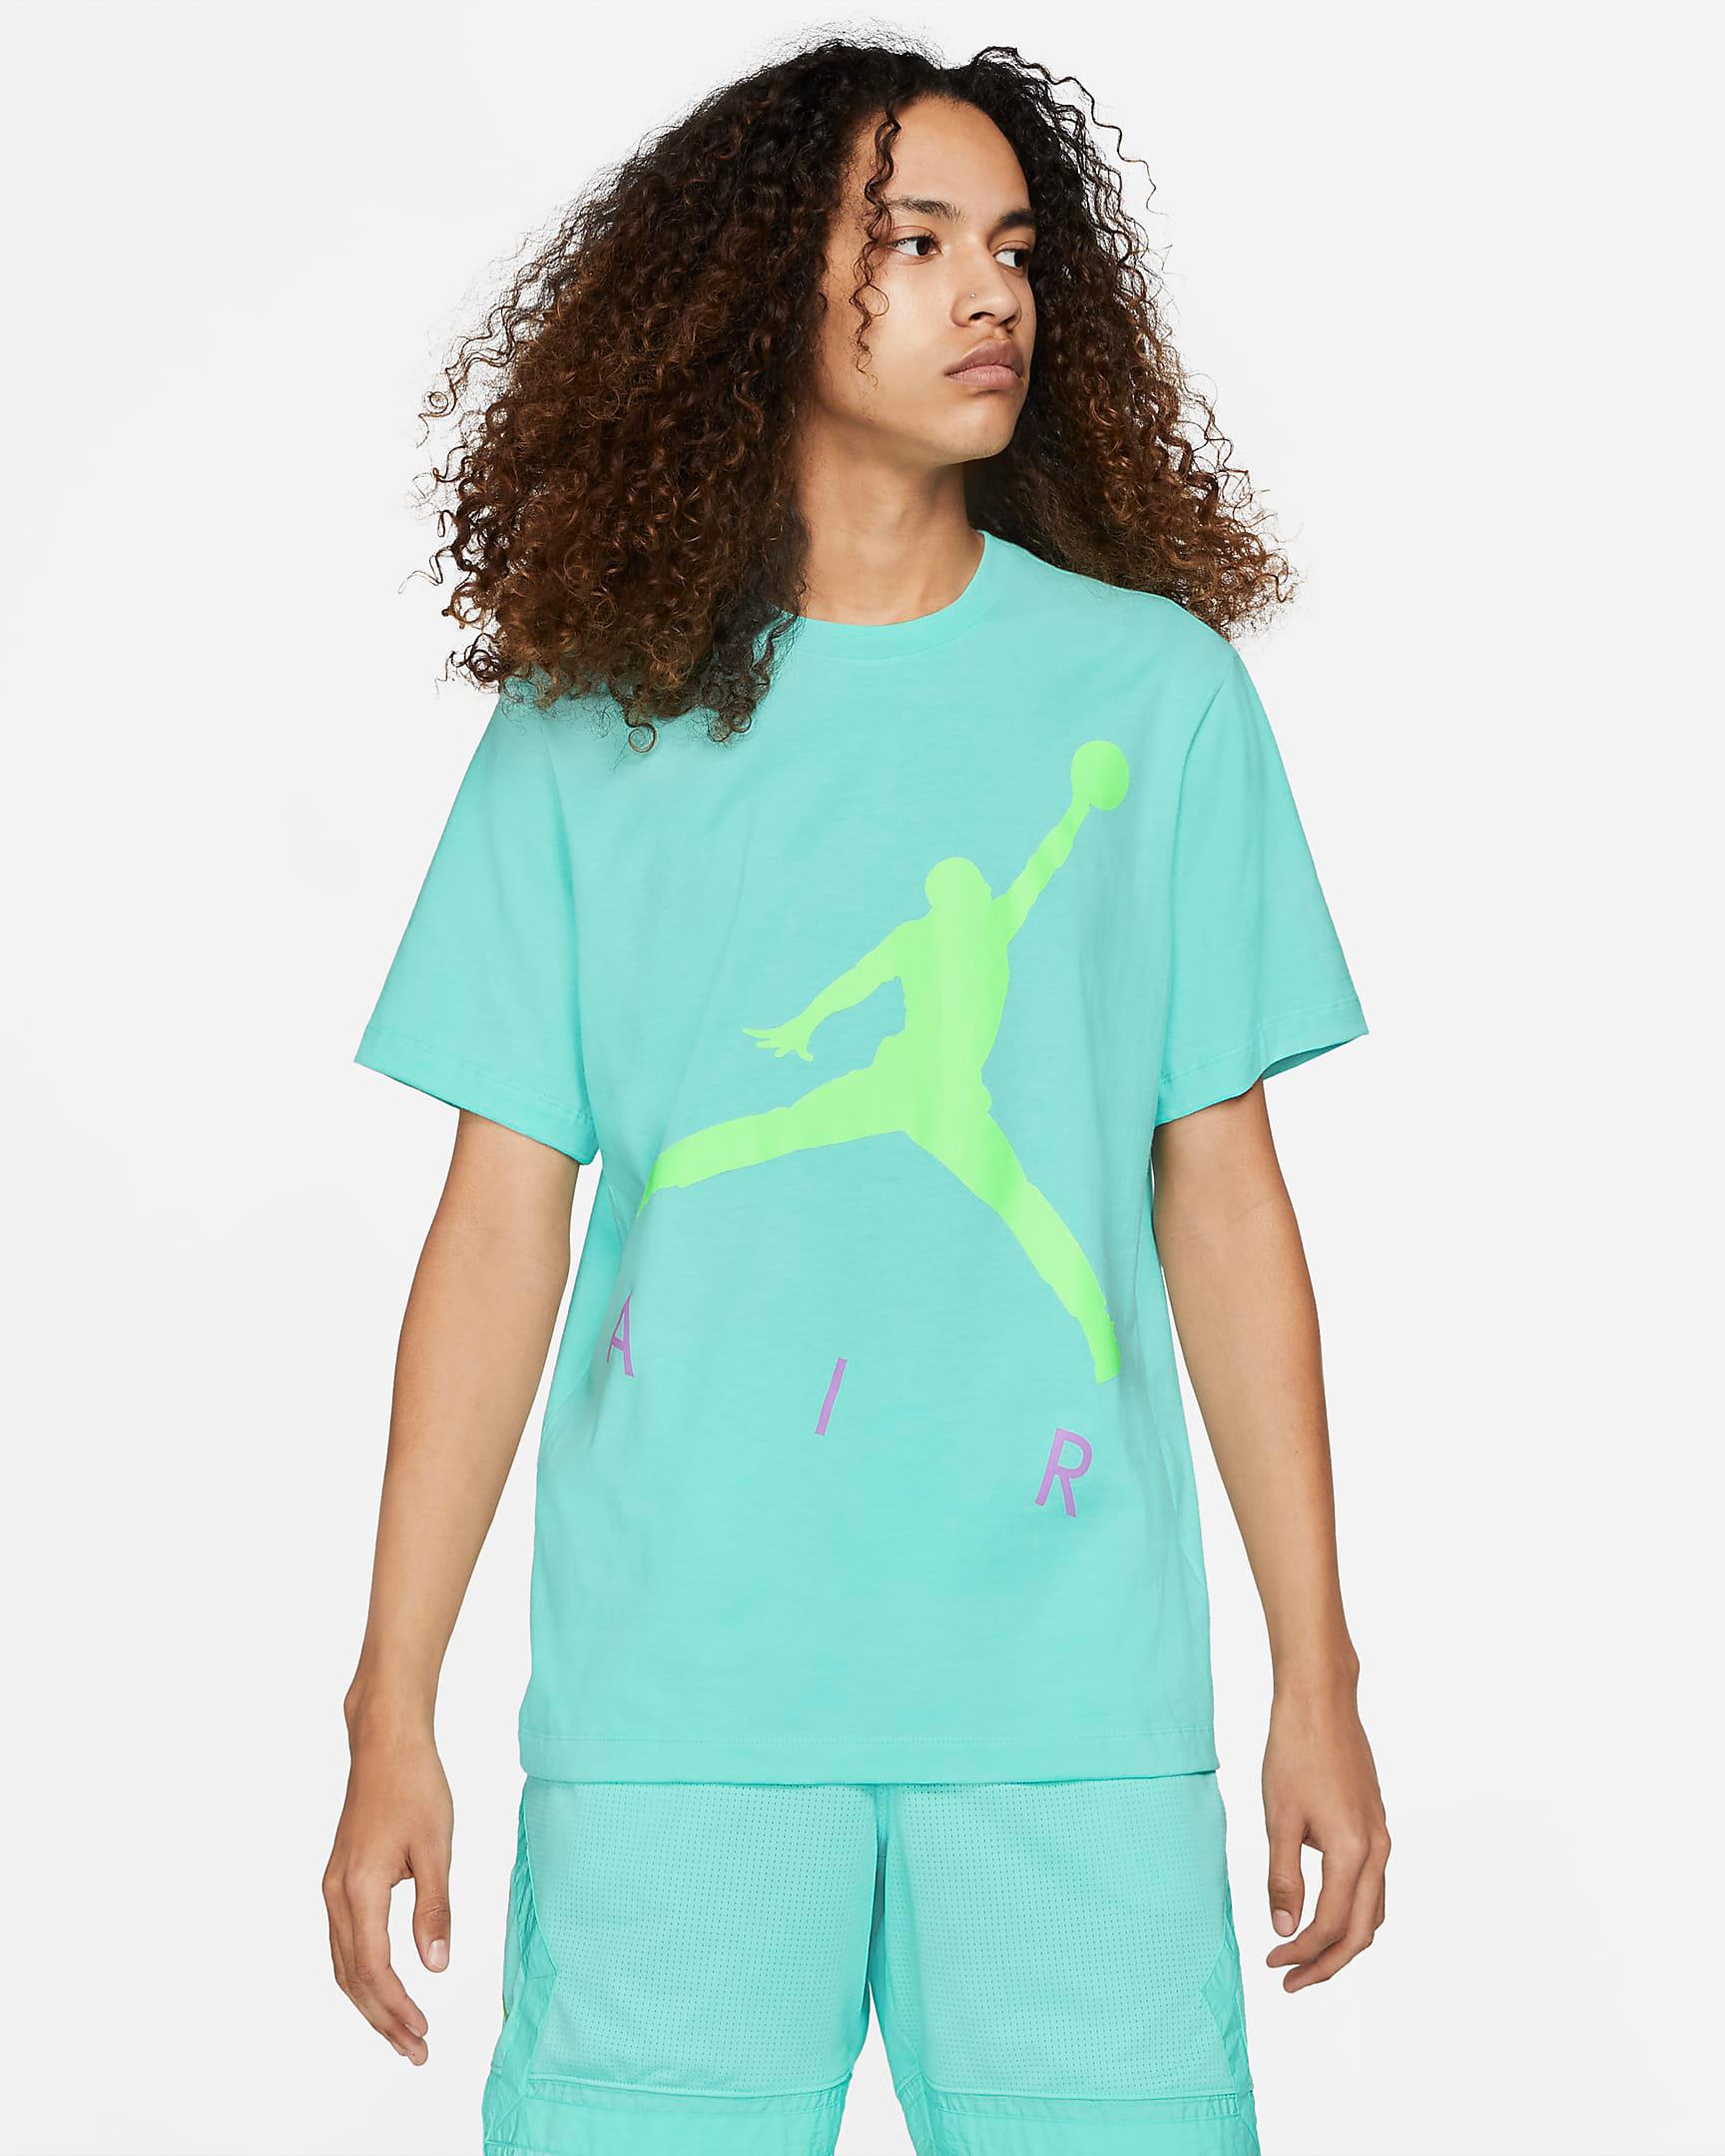 jordan-tropical-twist-jumpman-air-shirt